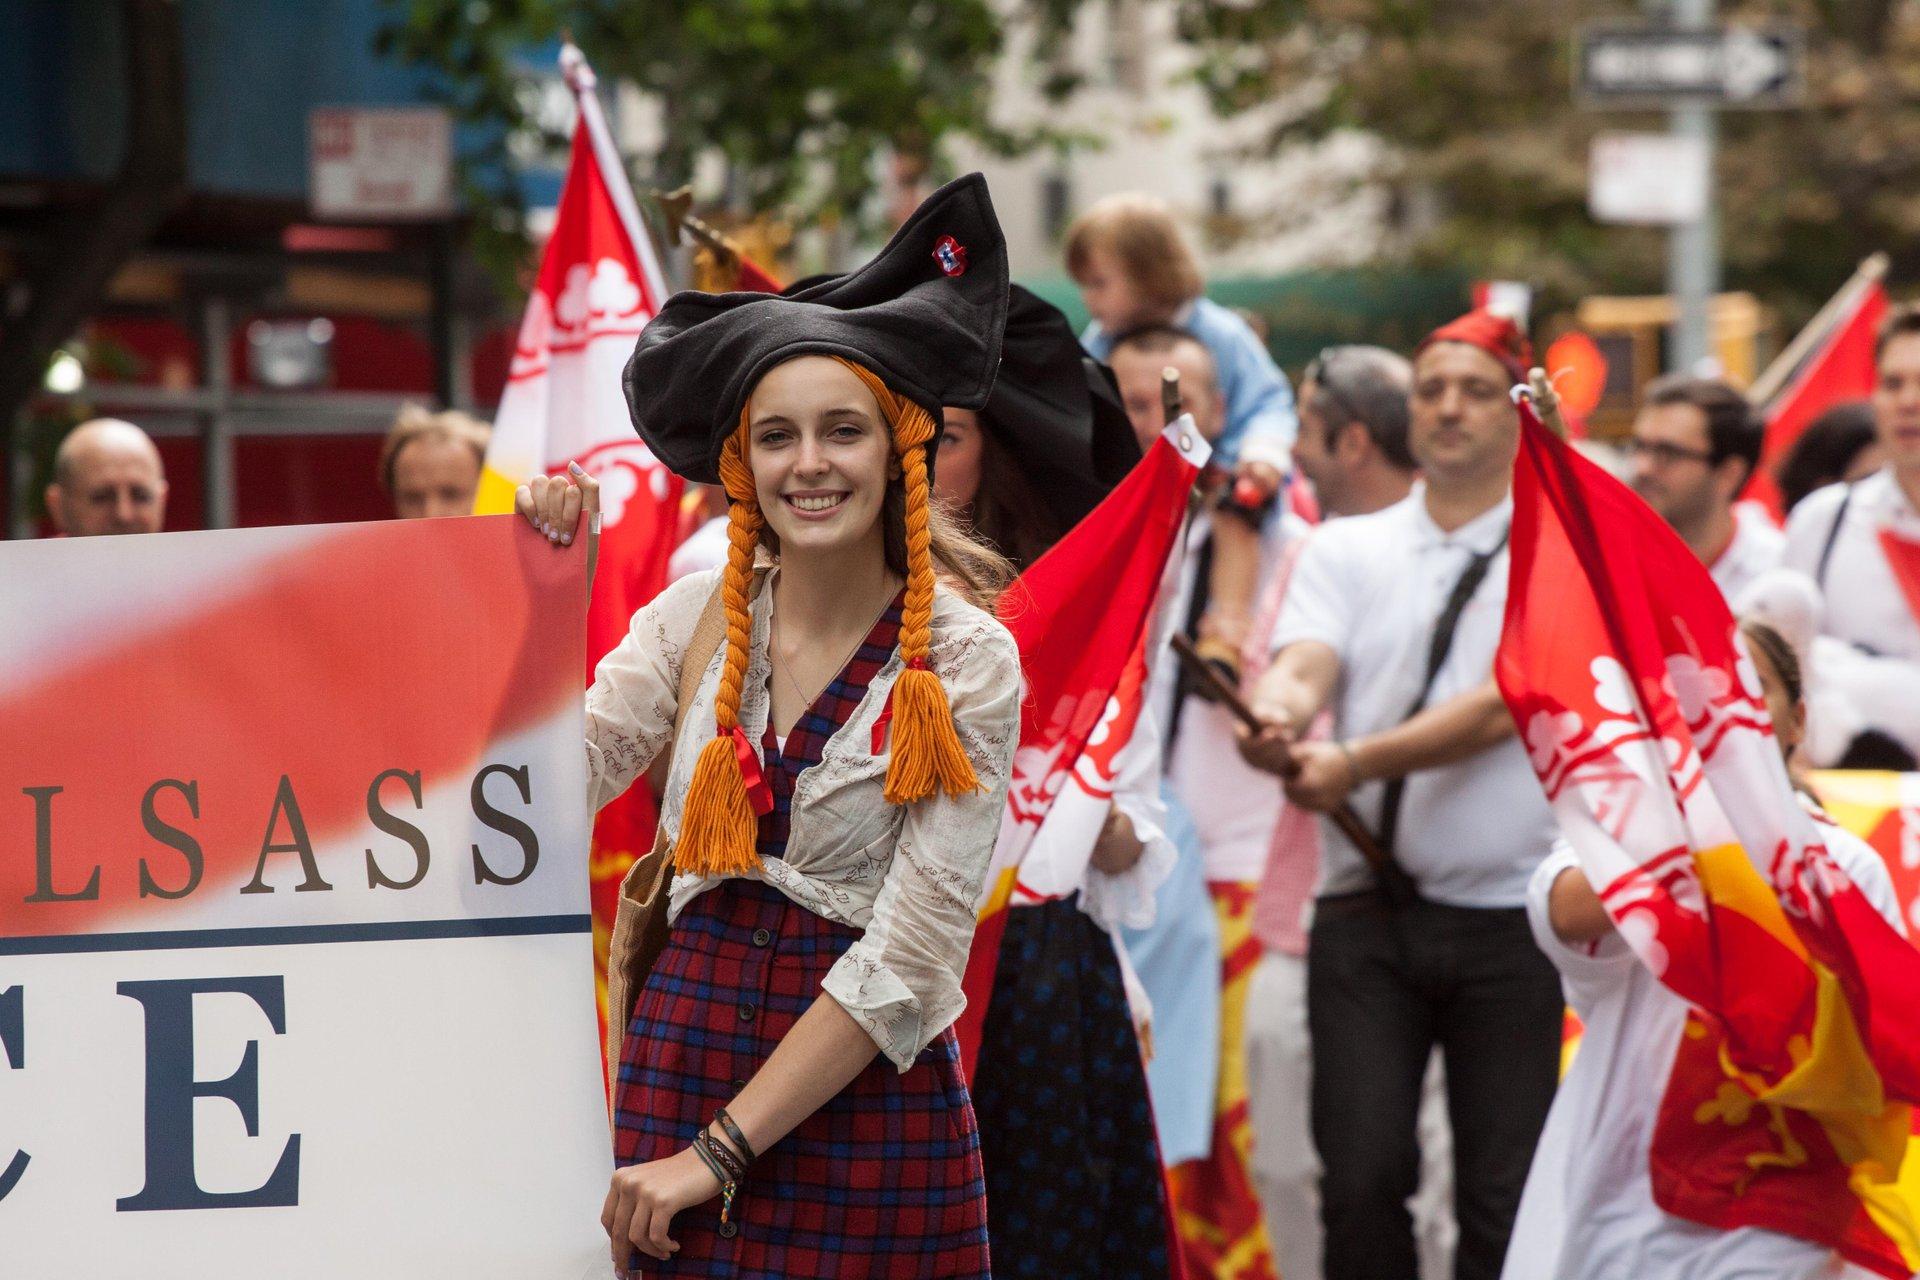 German-American Steuben Parade in New York 2020 - Best Time